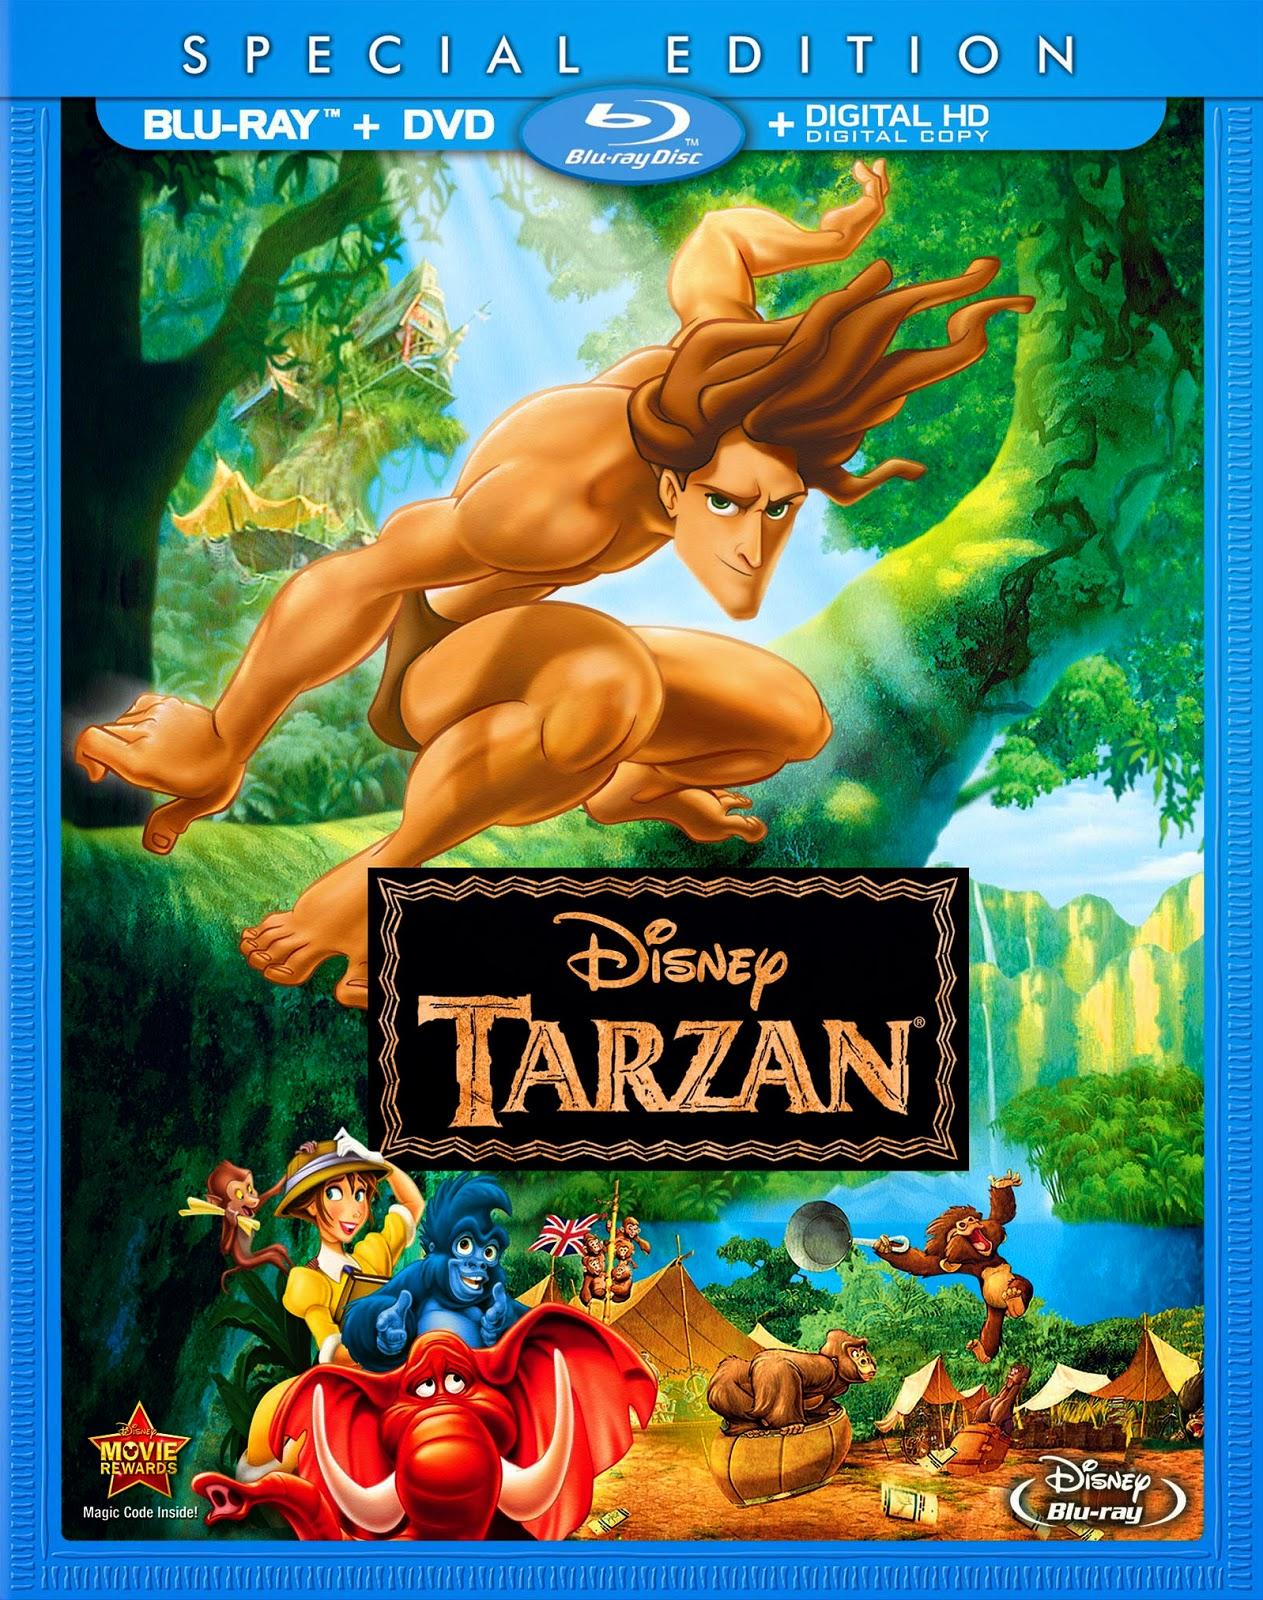 NIXPIX DVD BLURAY Reviews TARZAN Bluray Walt